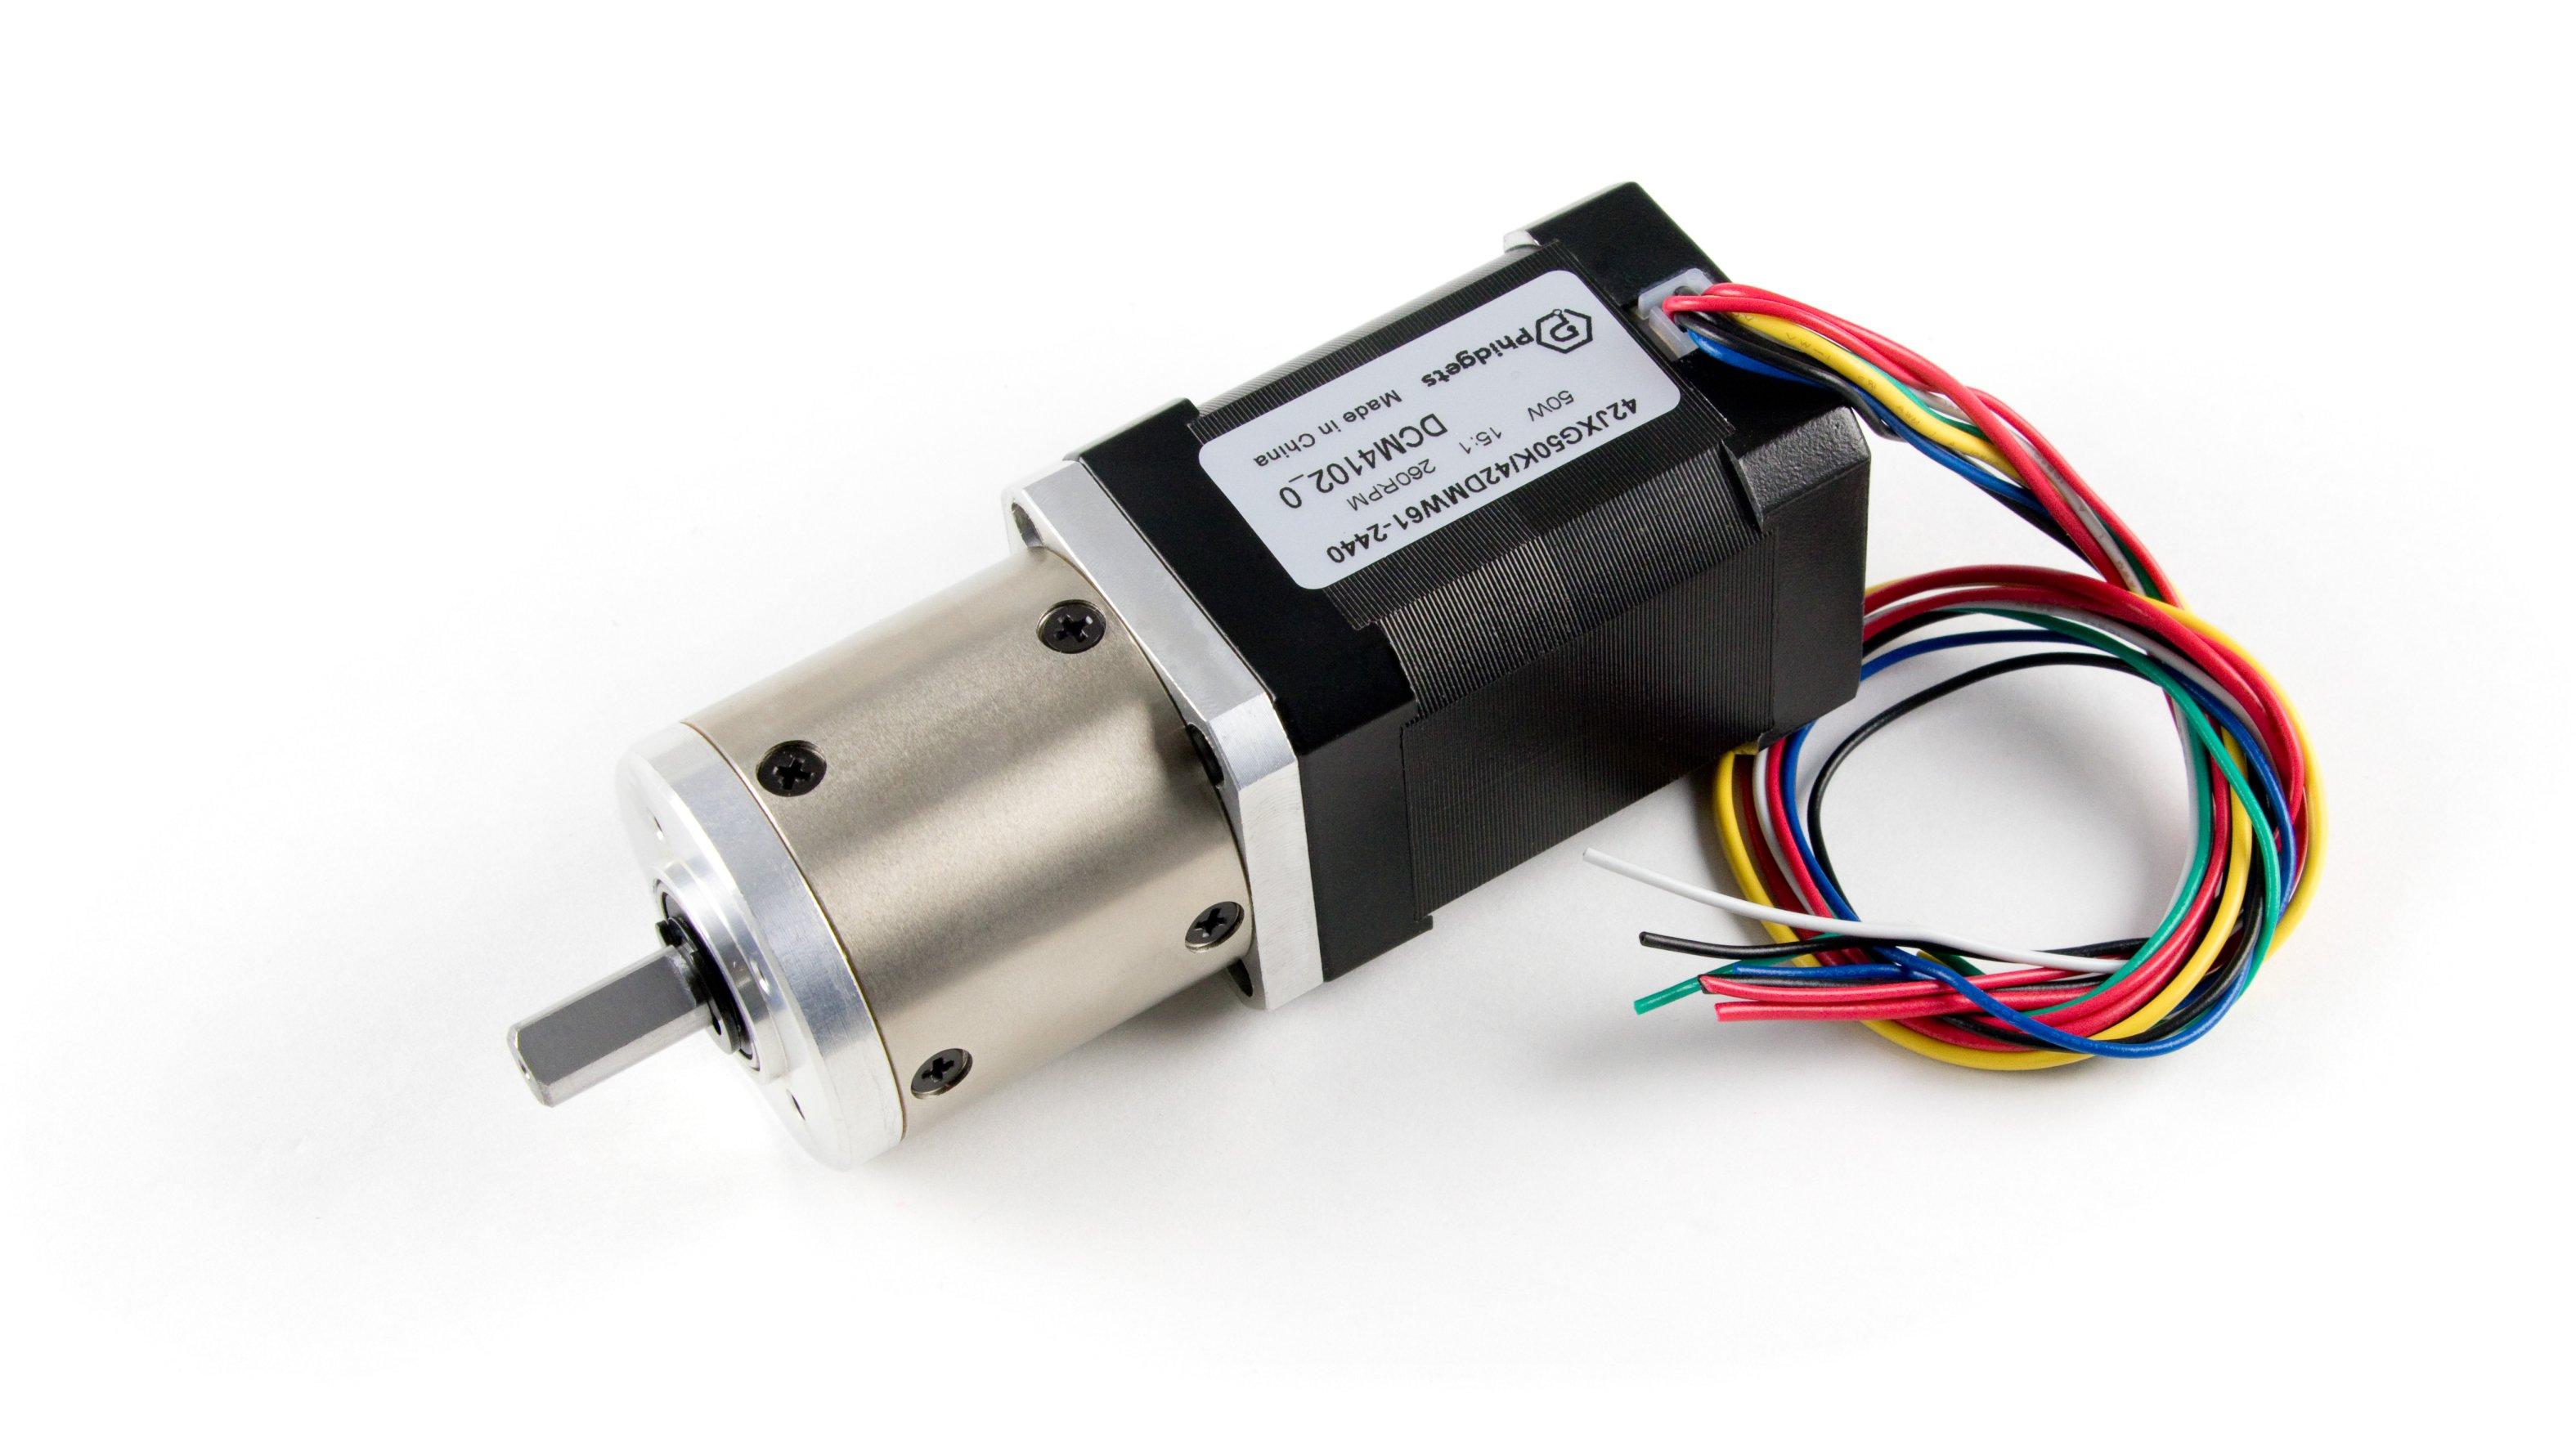 42DMW61 NEMA17 Brushless Motor with 15:1 Gearbox - DCM4102_0